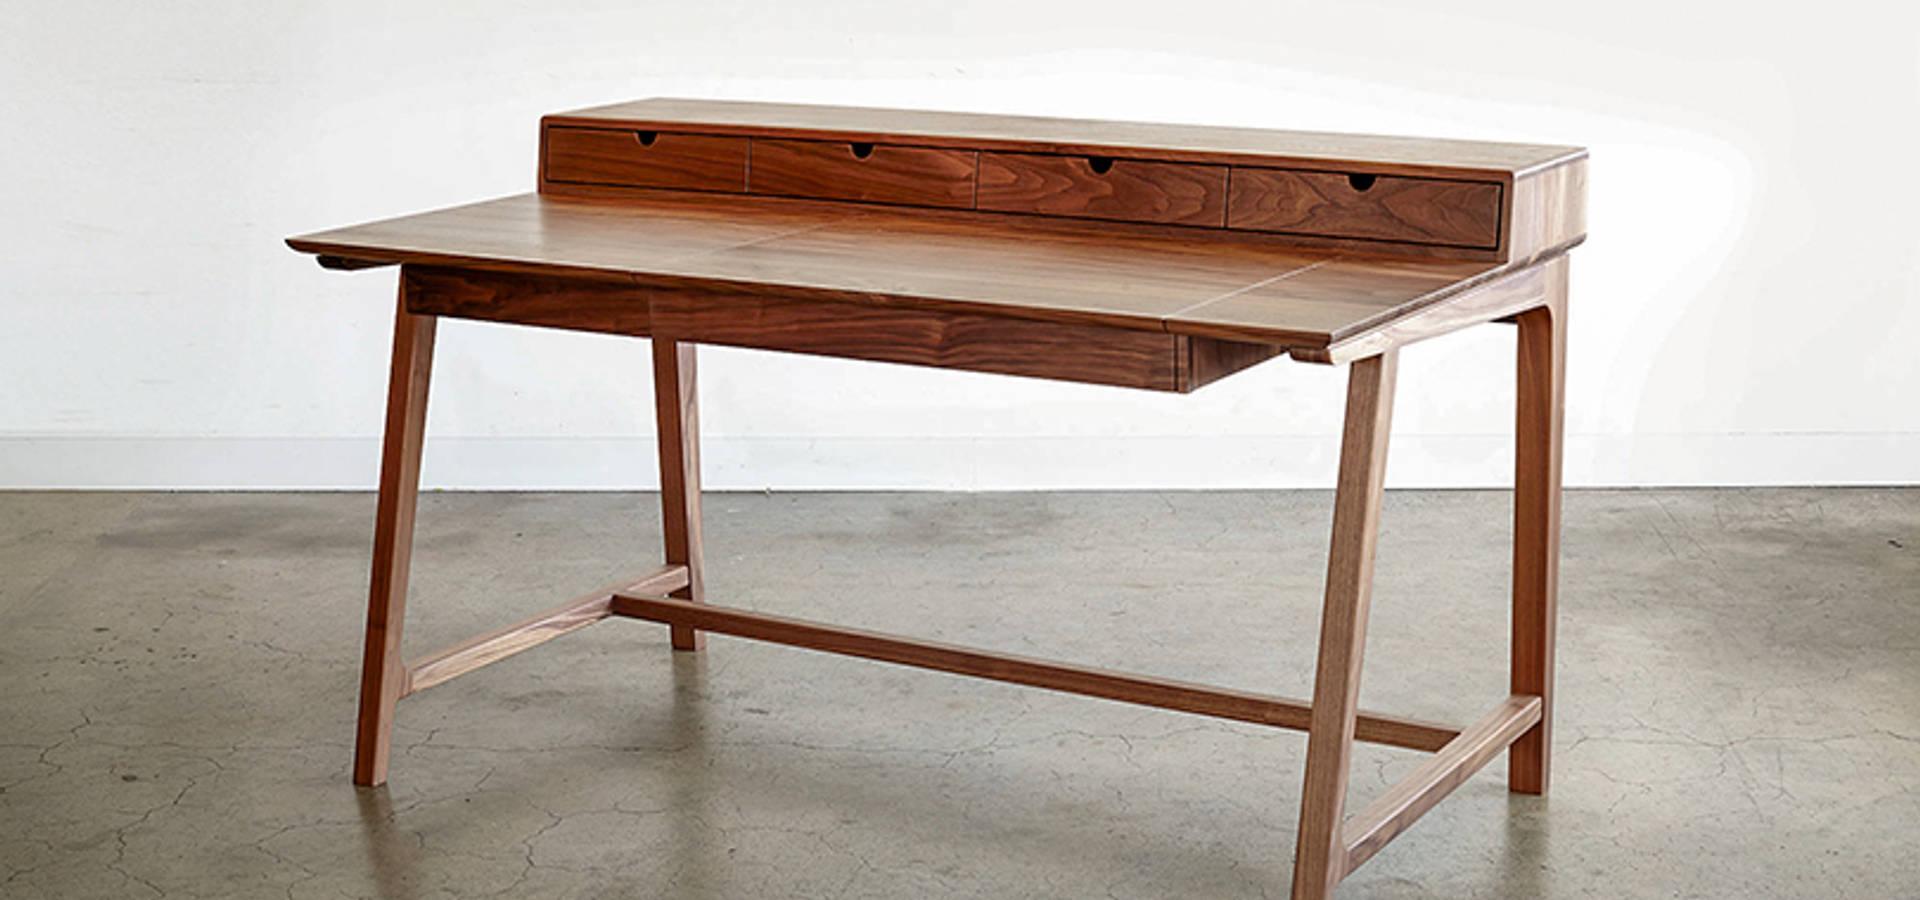 Jacob Hobson Furniture